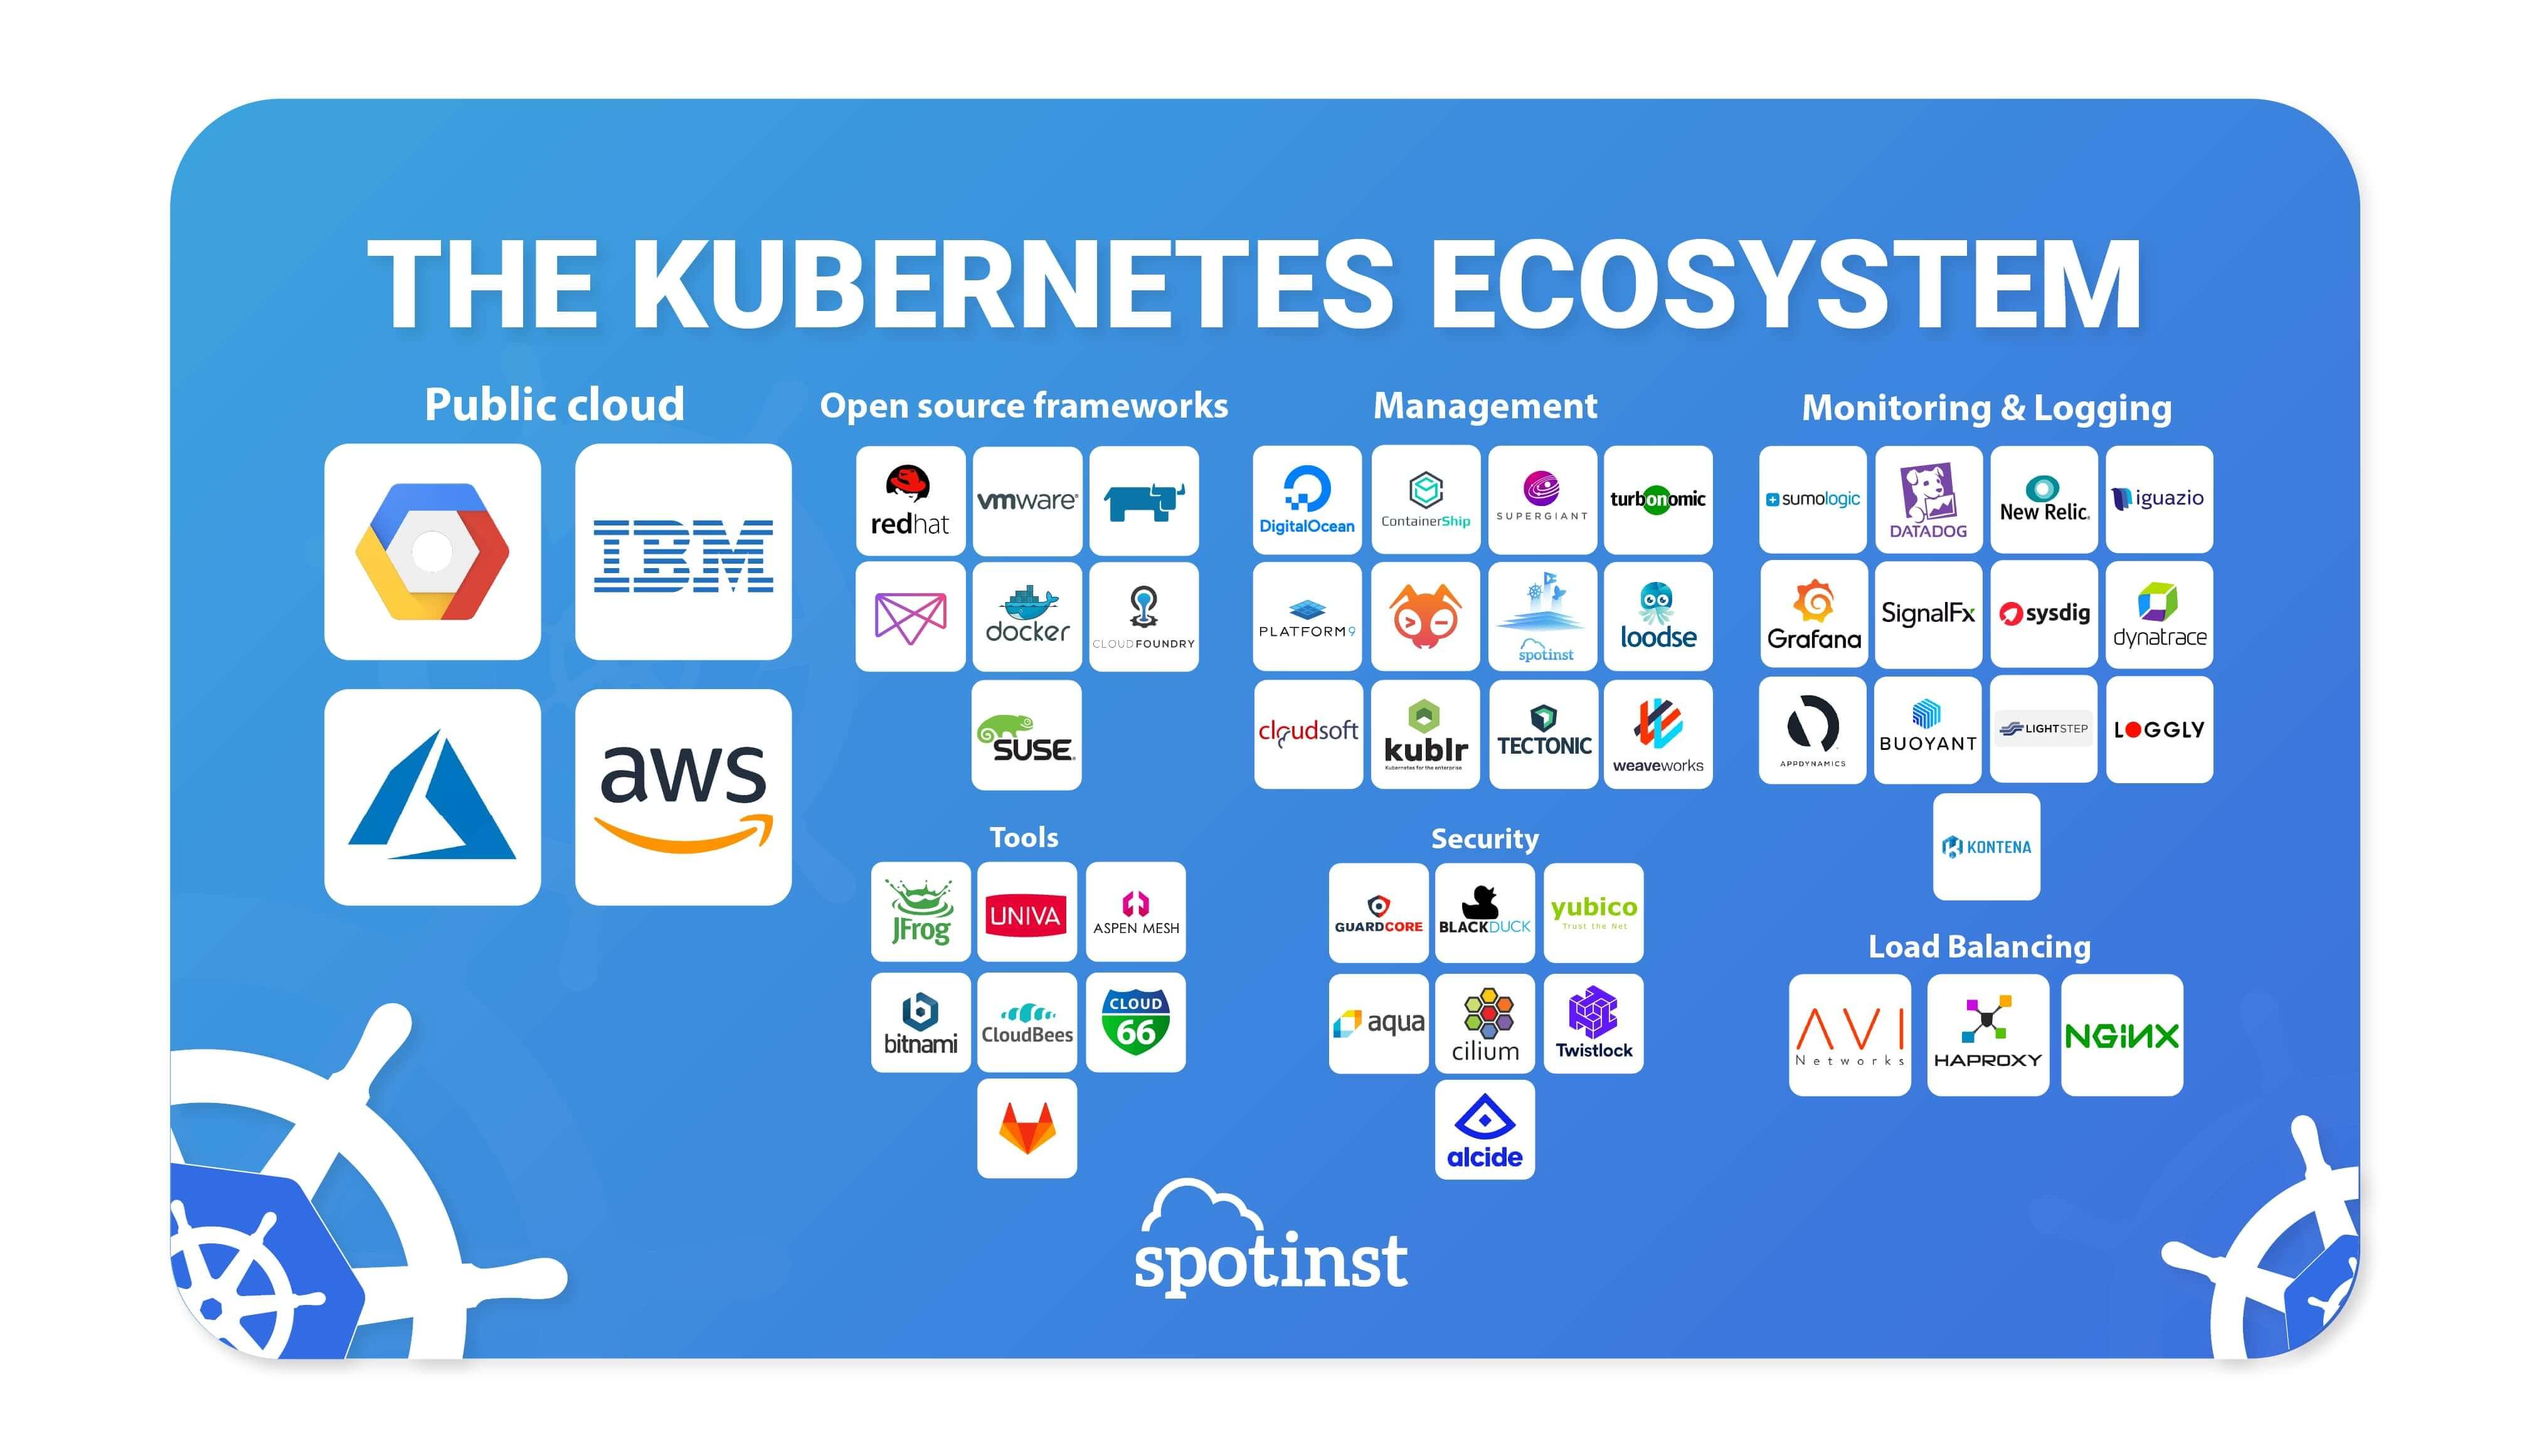 Kubernetes Ecosystem by Spotinst